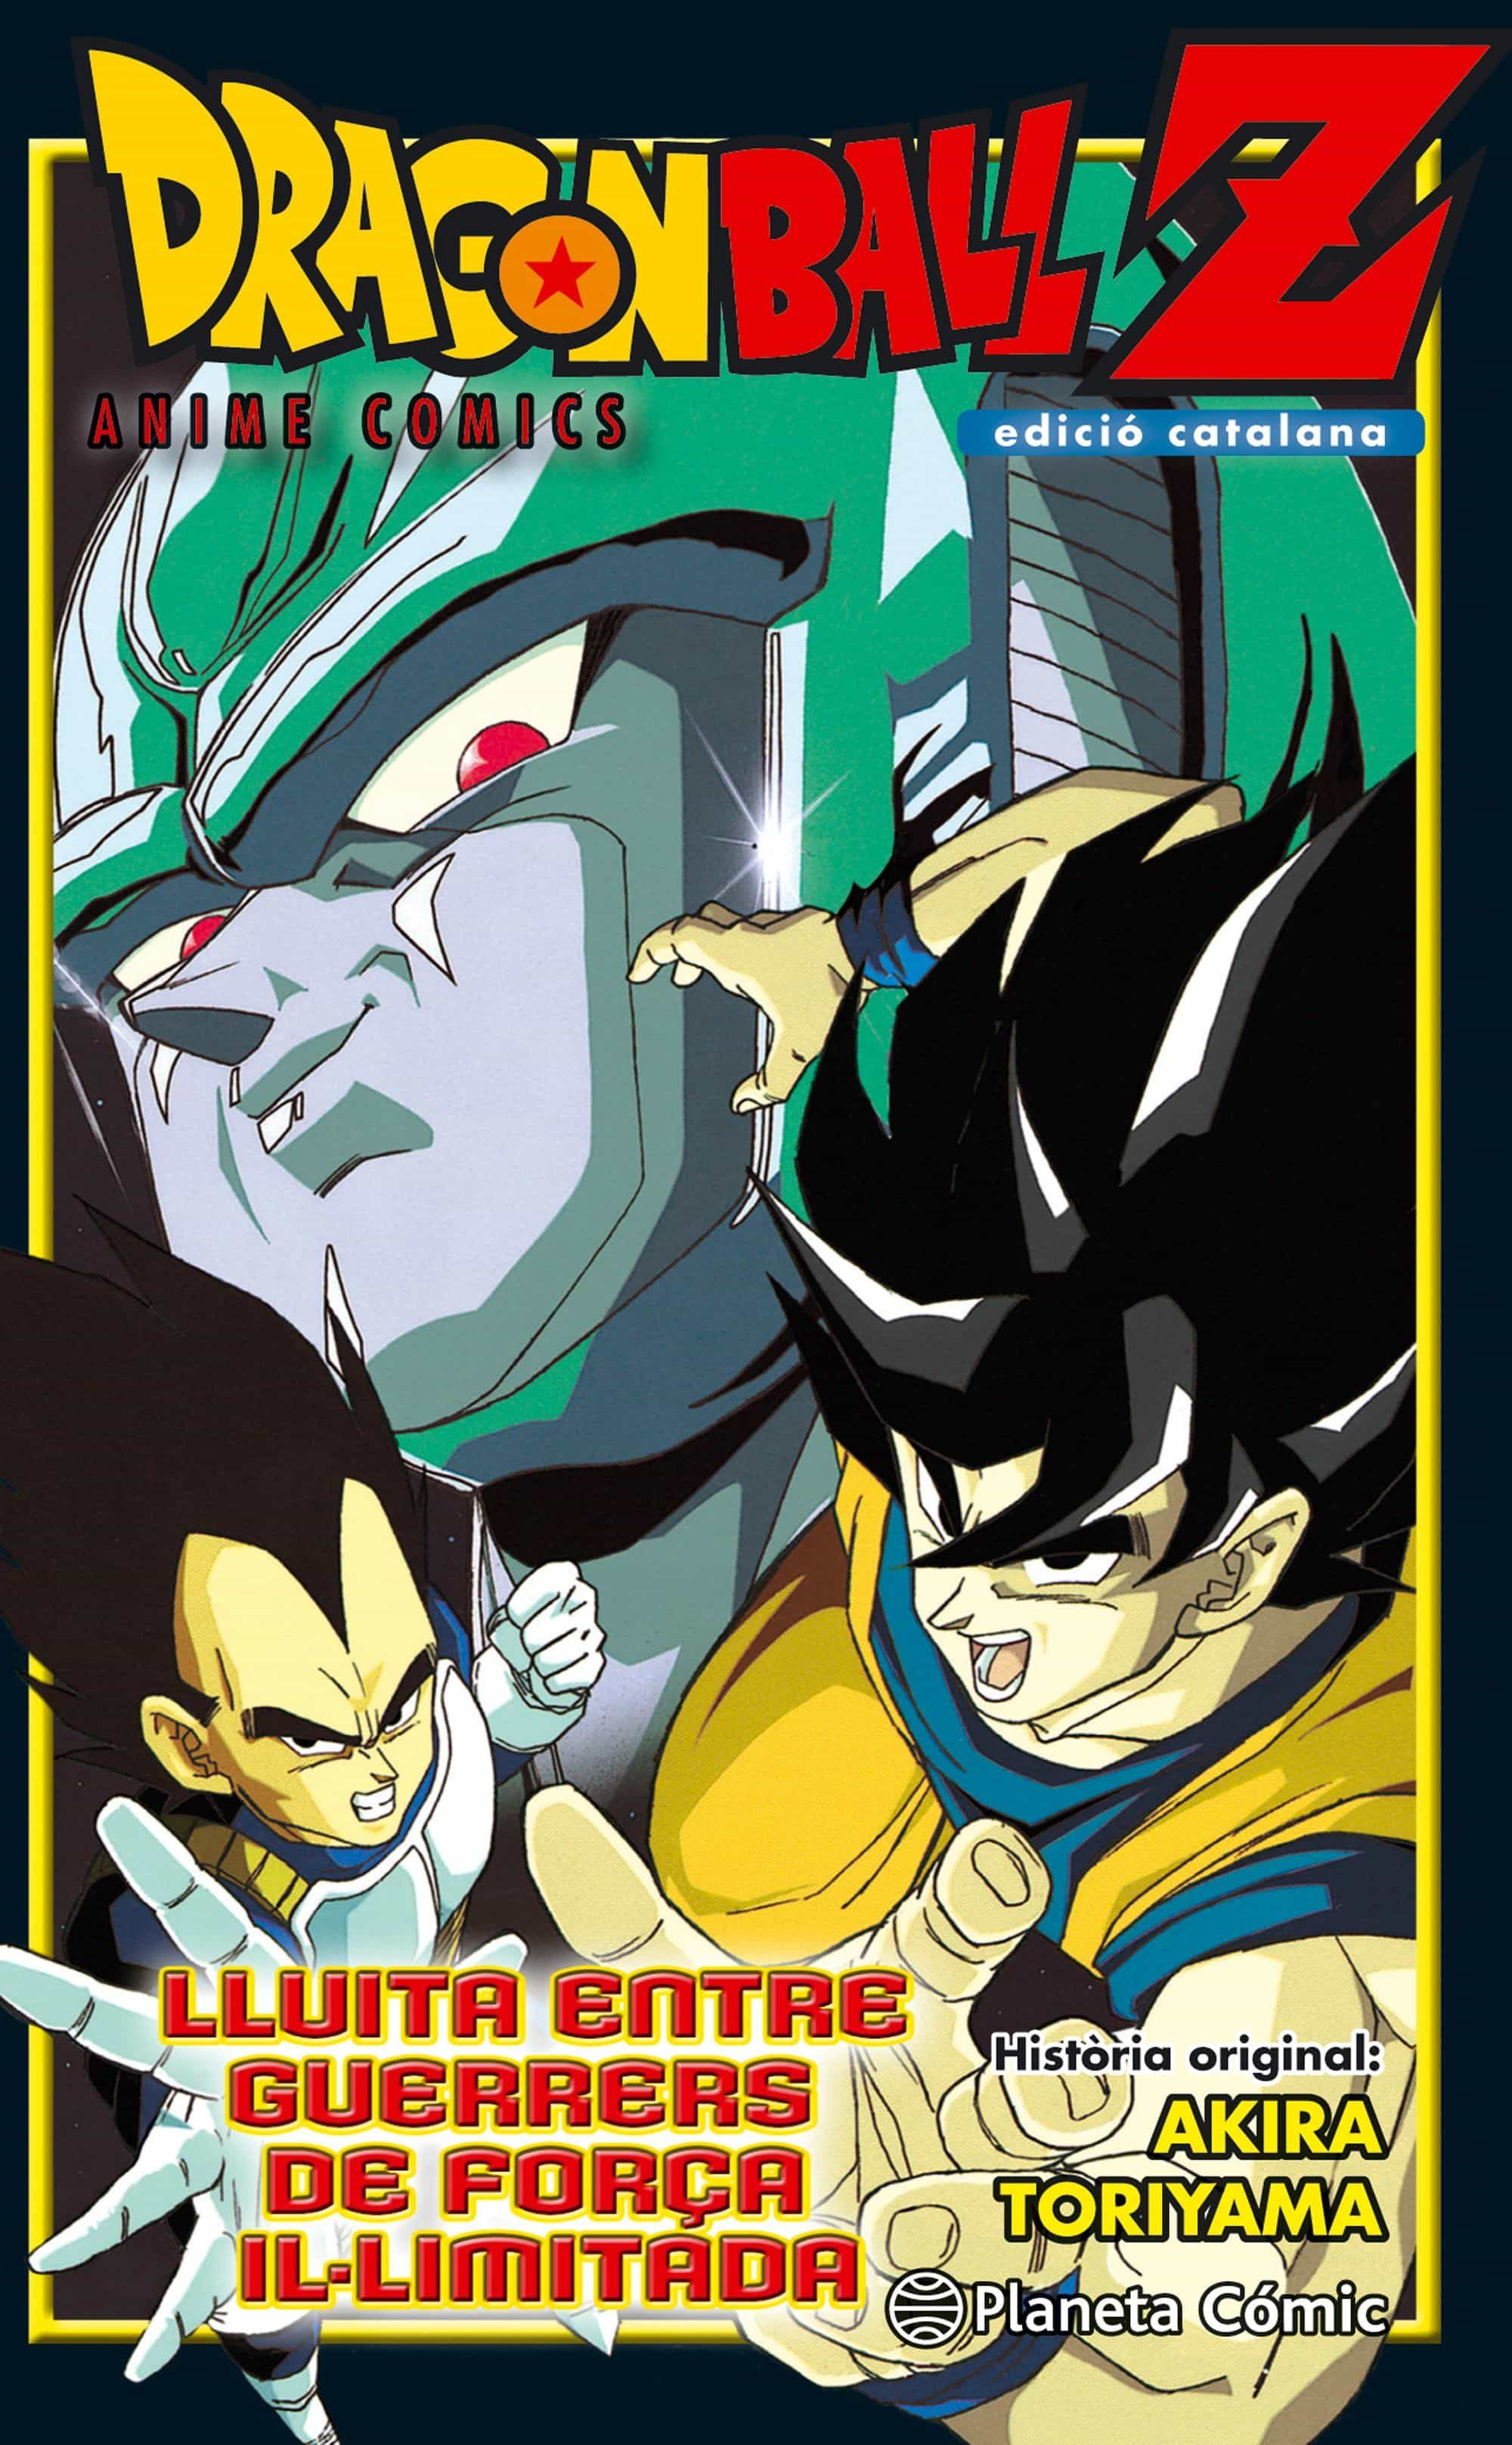 Bola De Drac Z Anime Comic ¡¡choque!! Guerreros De 10.000.000.000 Pode - Toriyama Akira